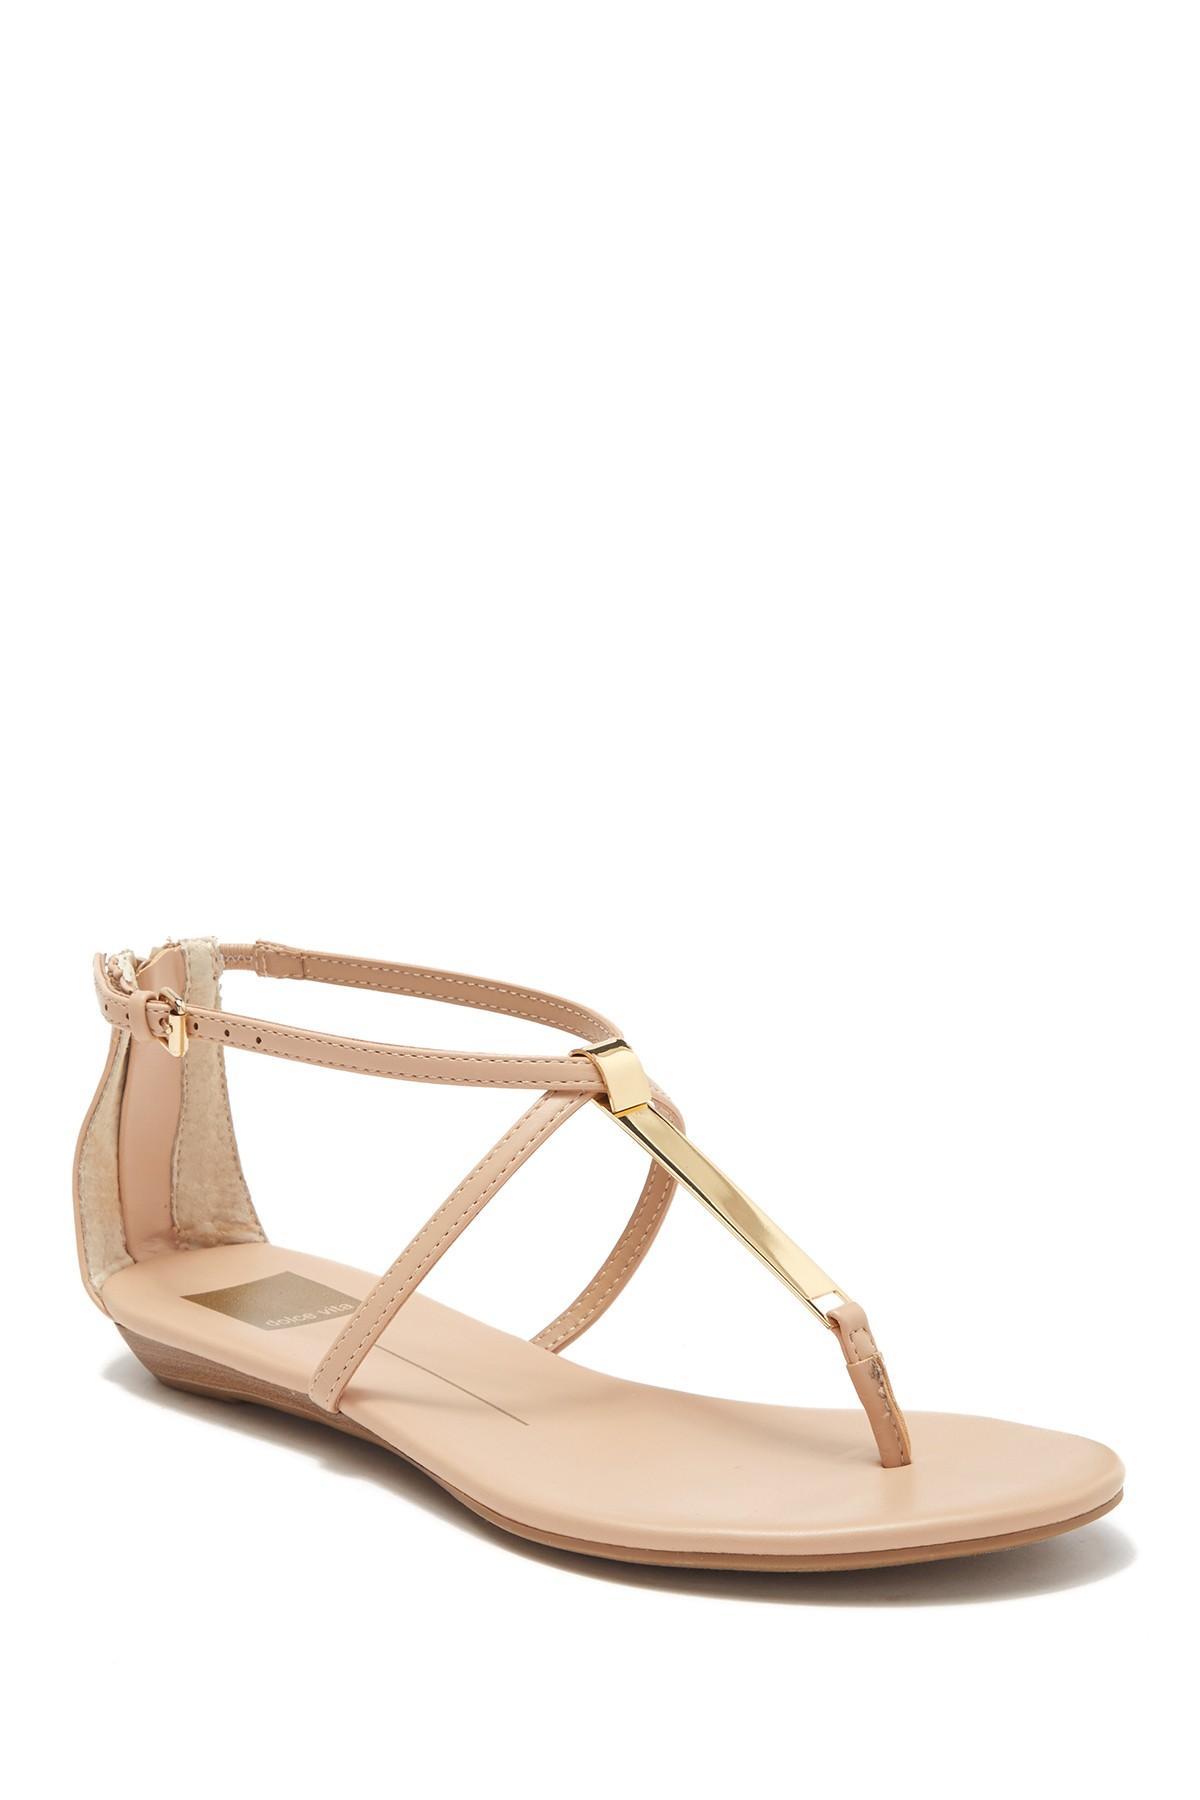 Dolce Vita Kylin Slide Sandal in Nude Leather (Natural) - Lyst